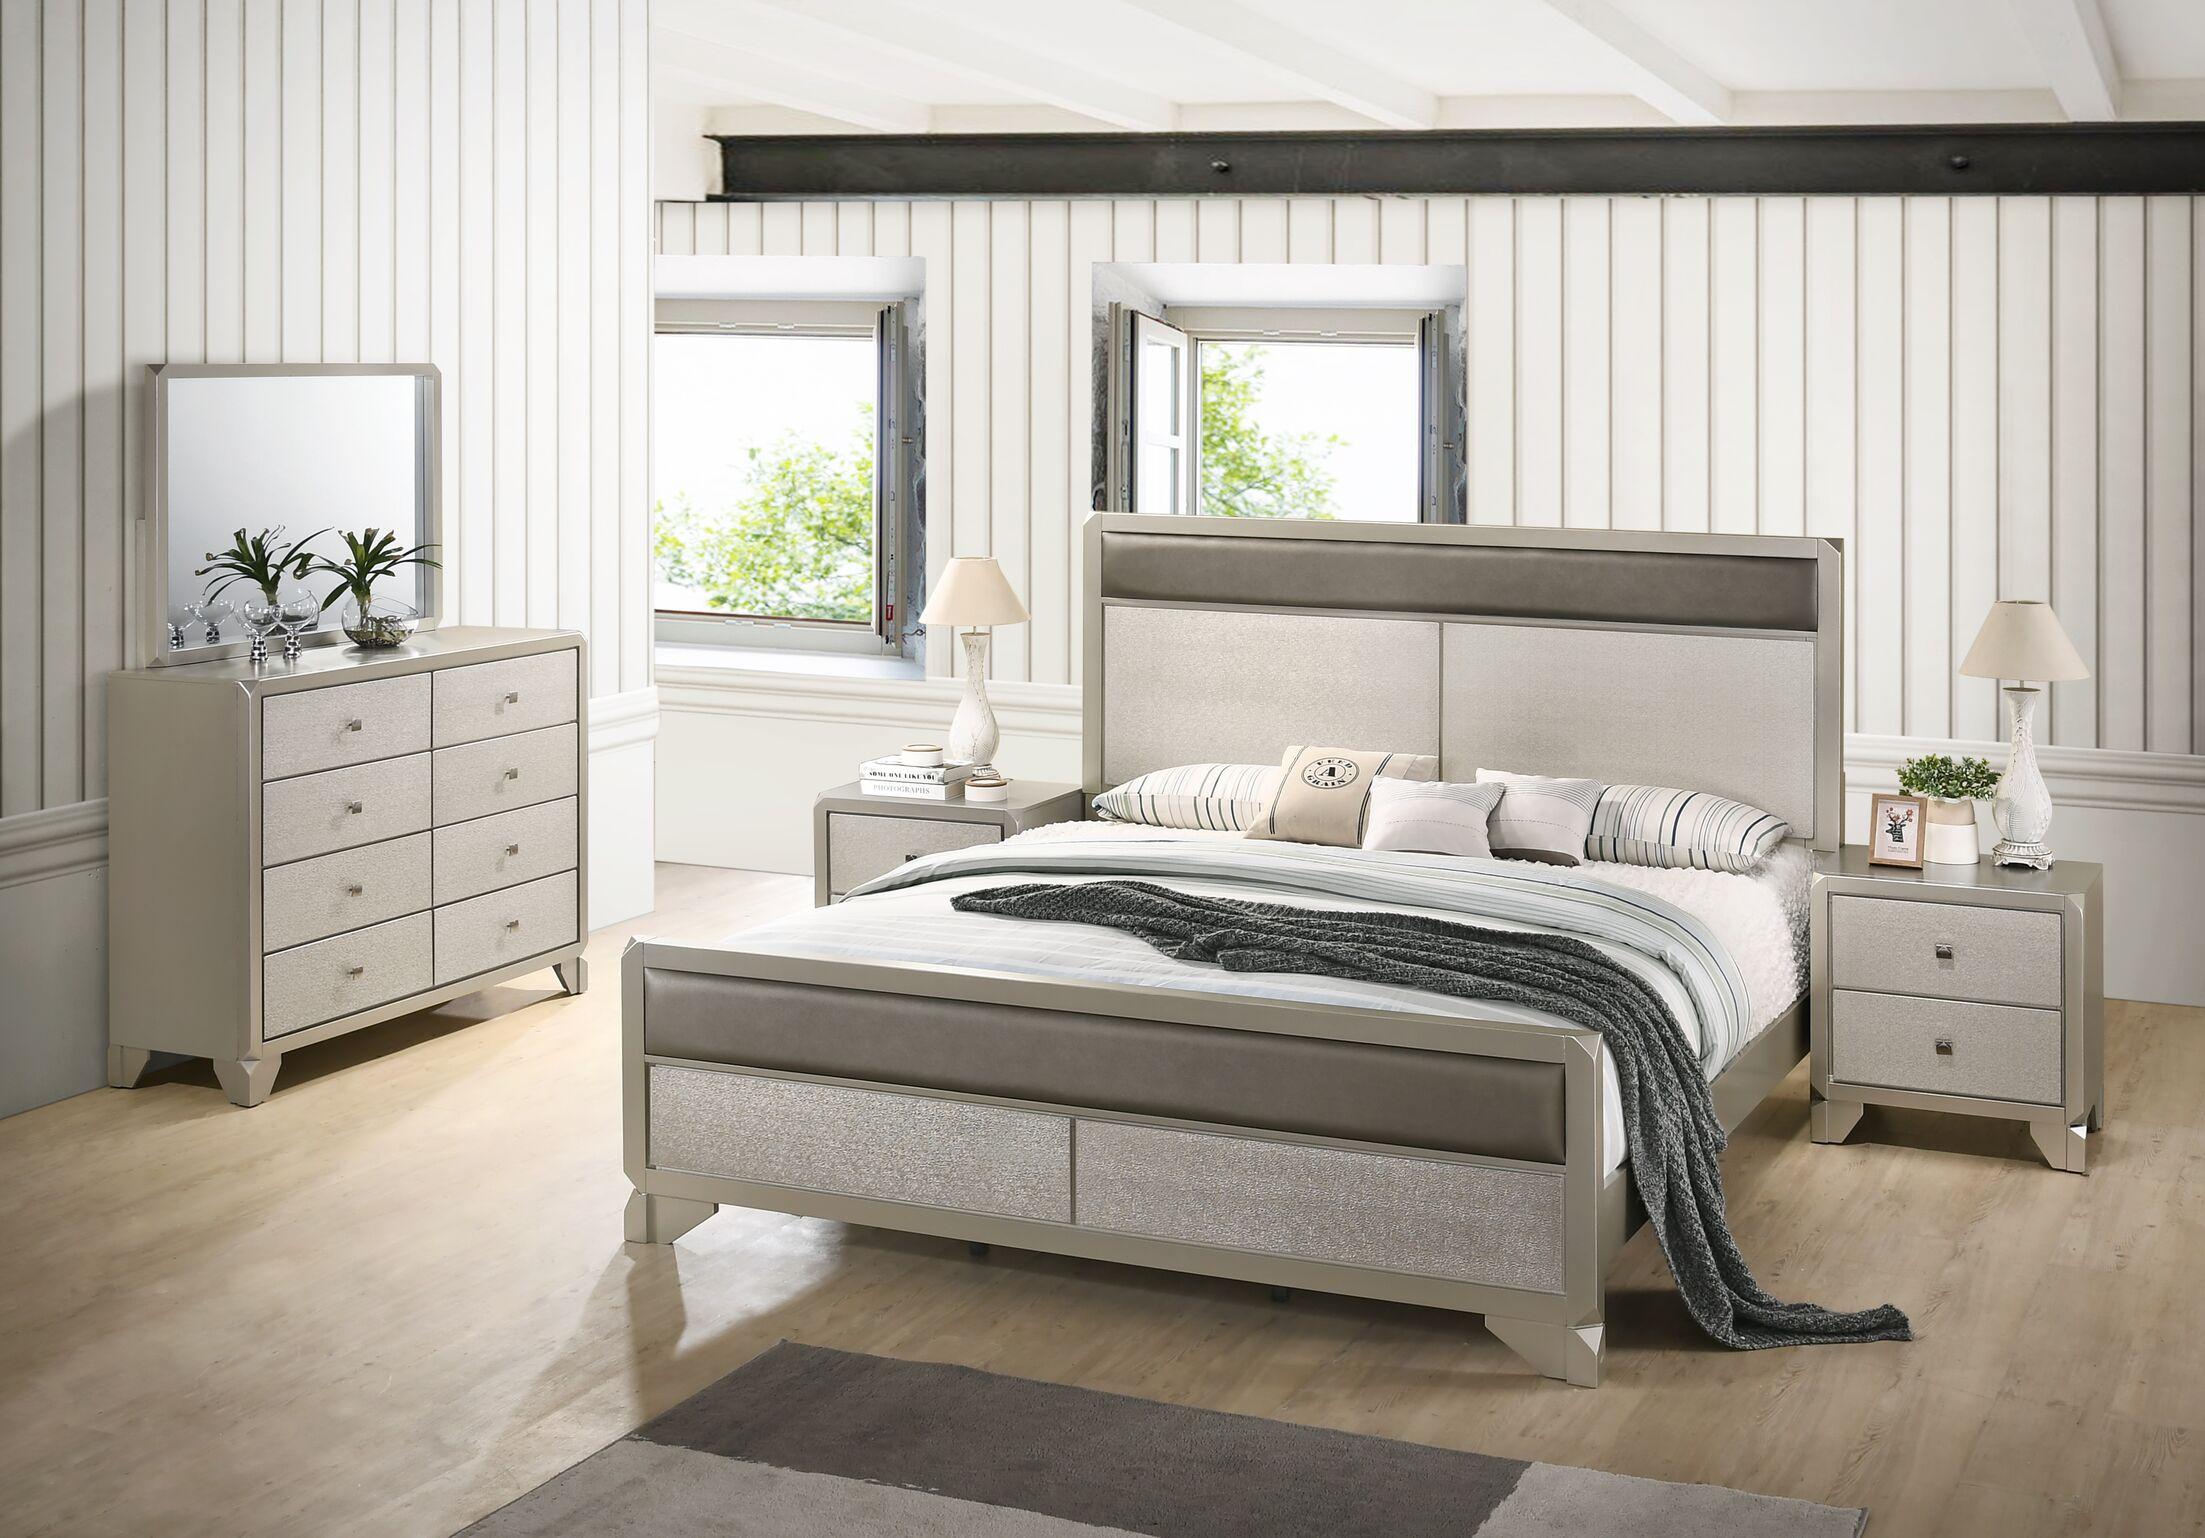 Yates Panel 4 Piece Bedroom Set Size: King